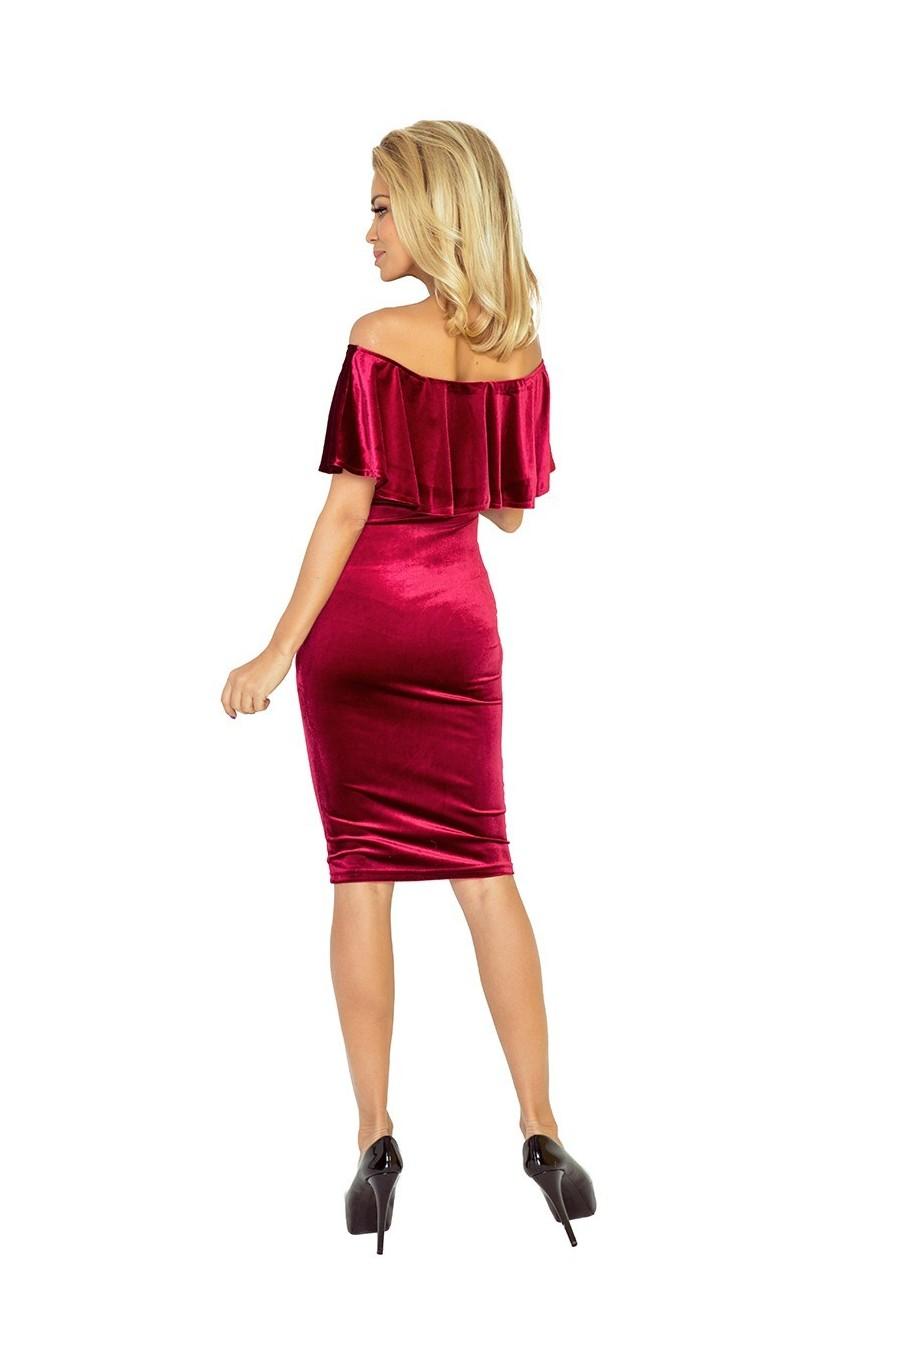 Šaty s límcem - velvet - burgundské 138-3